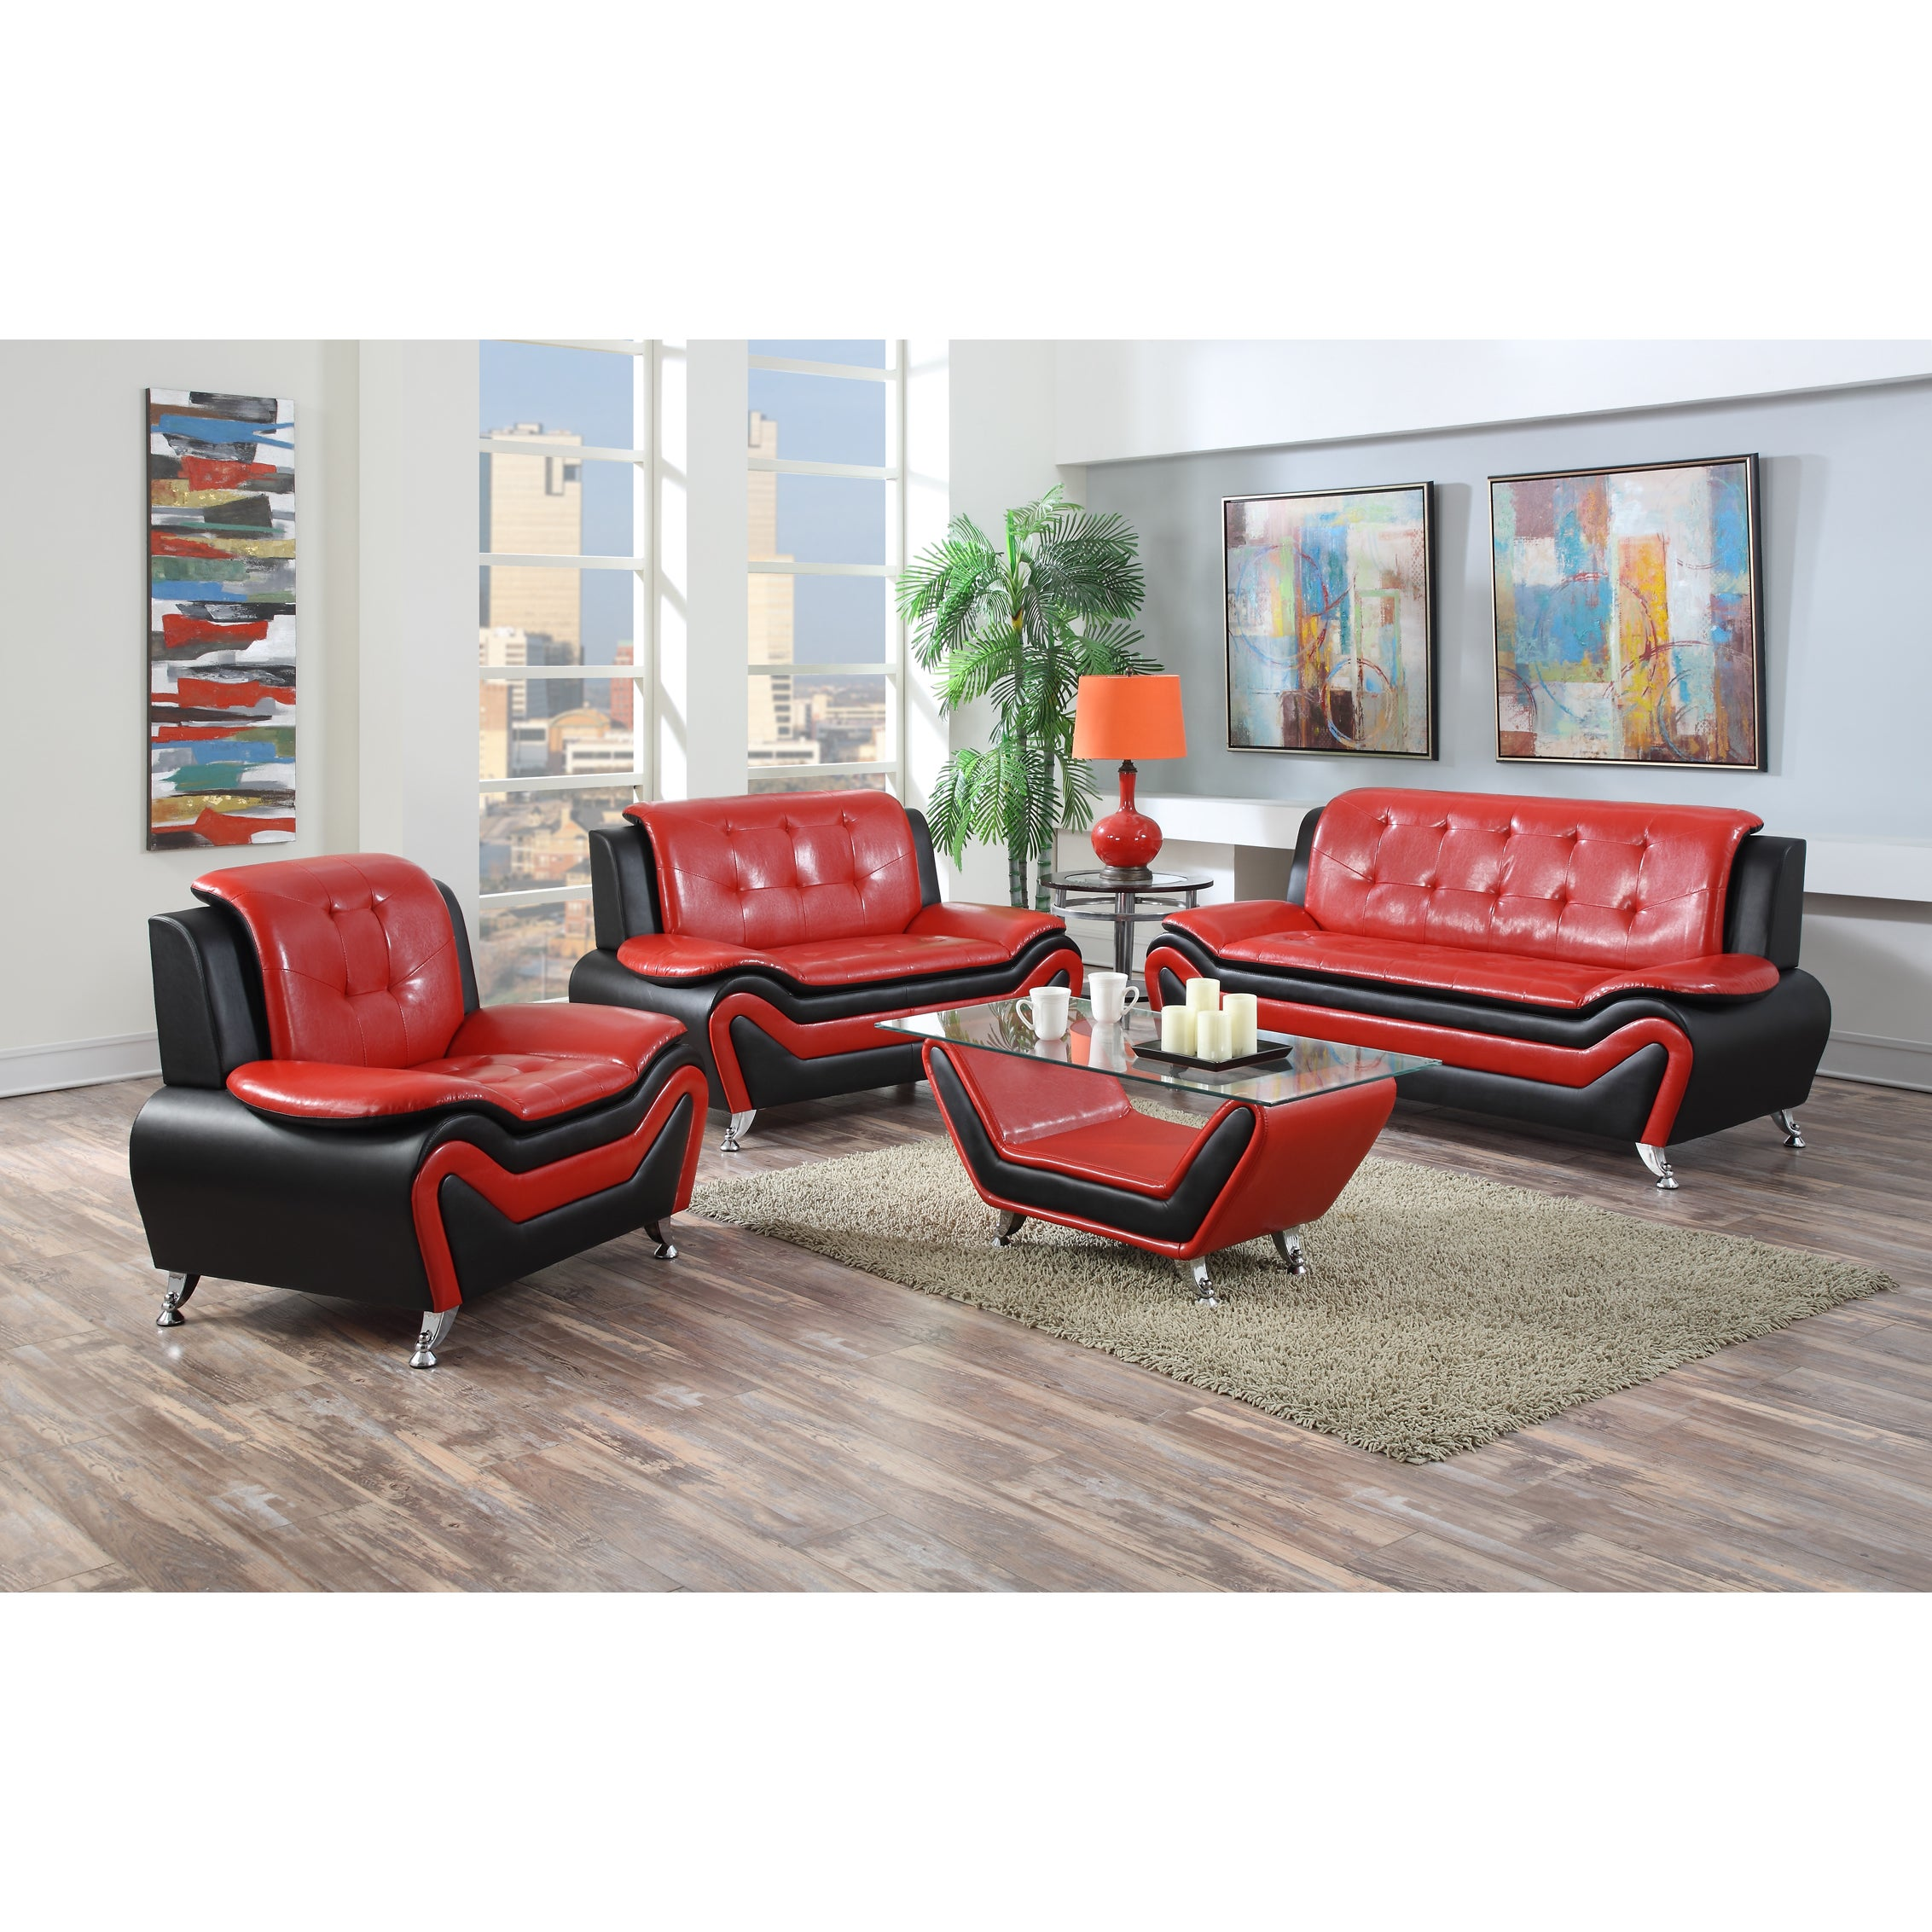 Shop Wanda 3-Piece Modern Bonded Leather Sofa Set - On Sale - Free ...